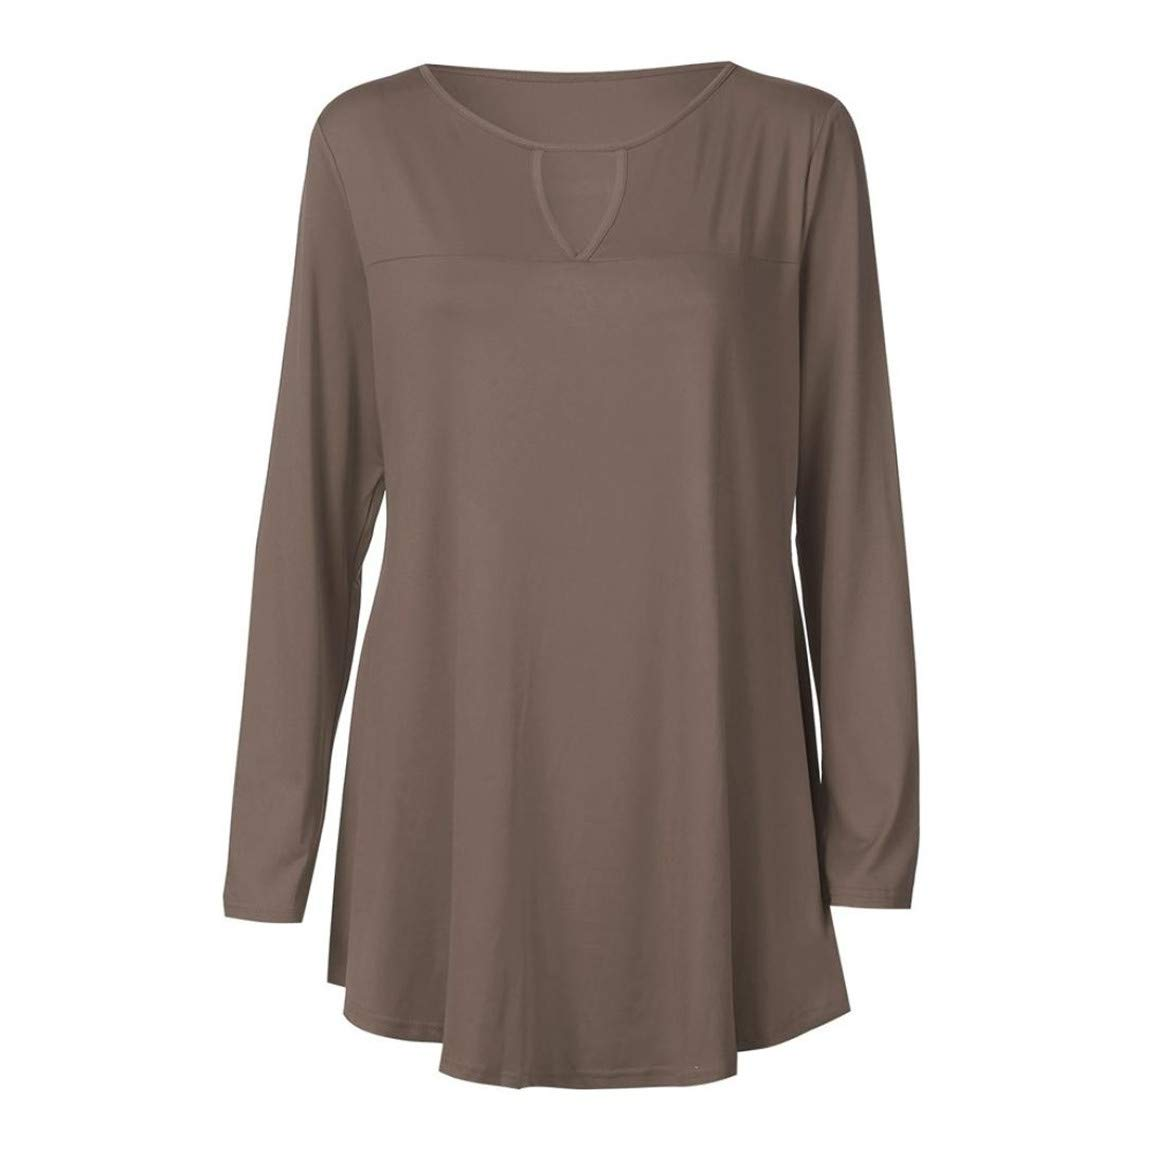 bellelove mujeres Crop Top, Mesdames manga corta blusa Casual tela ...